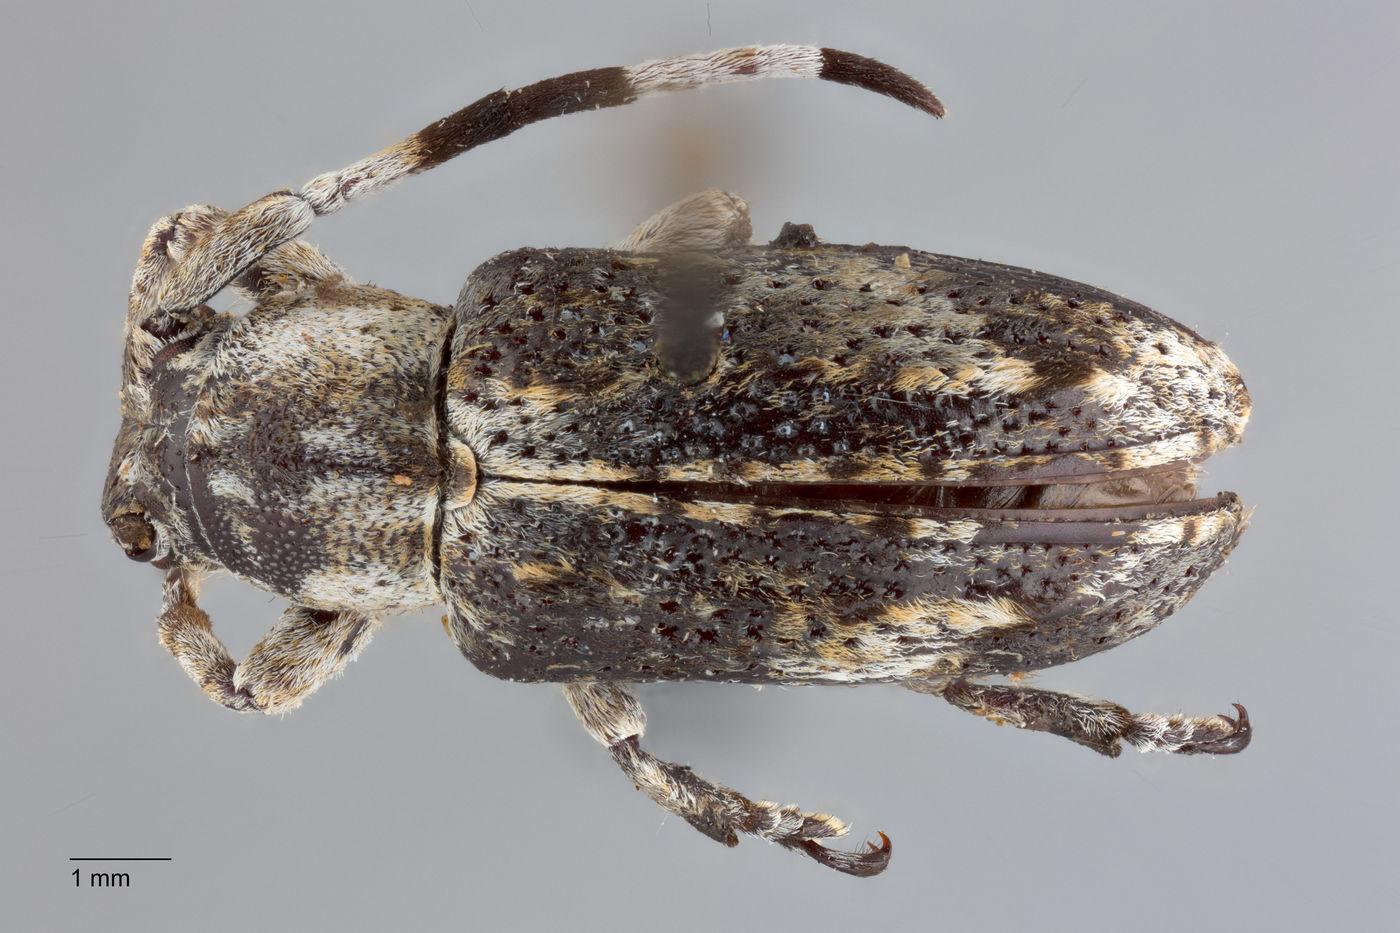 Pterolophia albonigra image